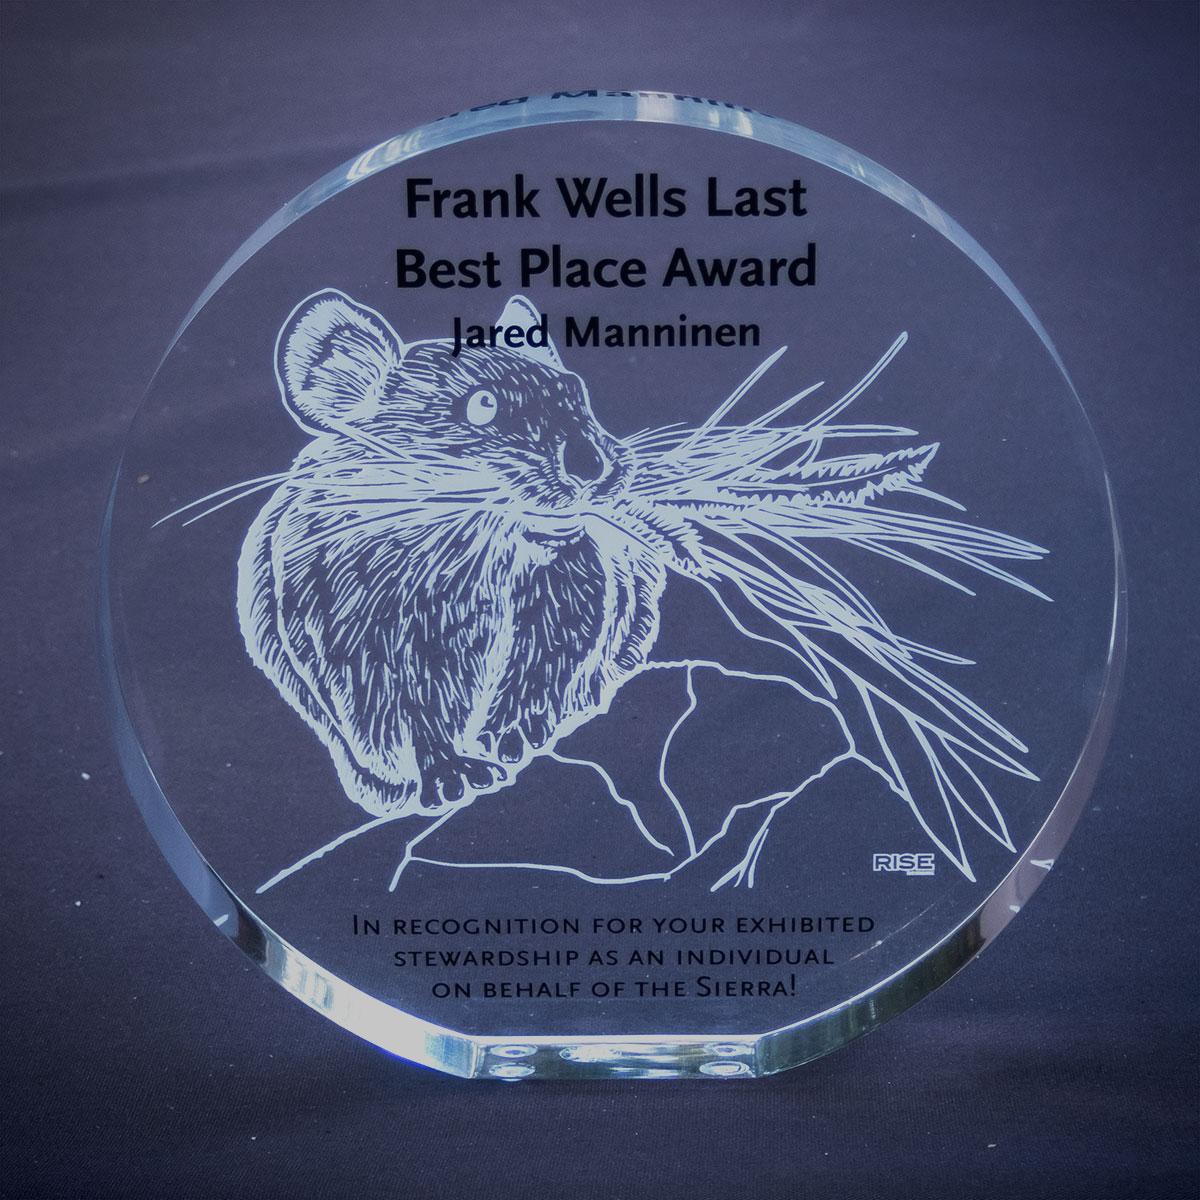 2020 Frank Wells Last Best Place Award - Jared Manninen